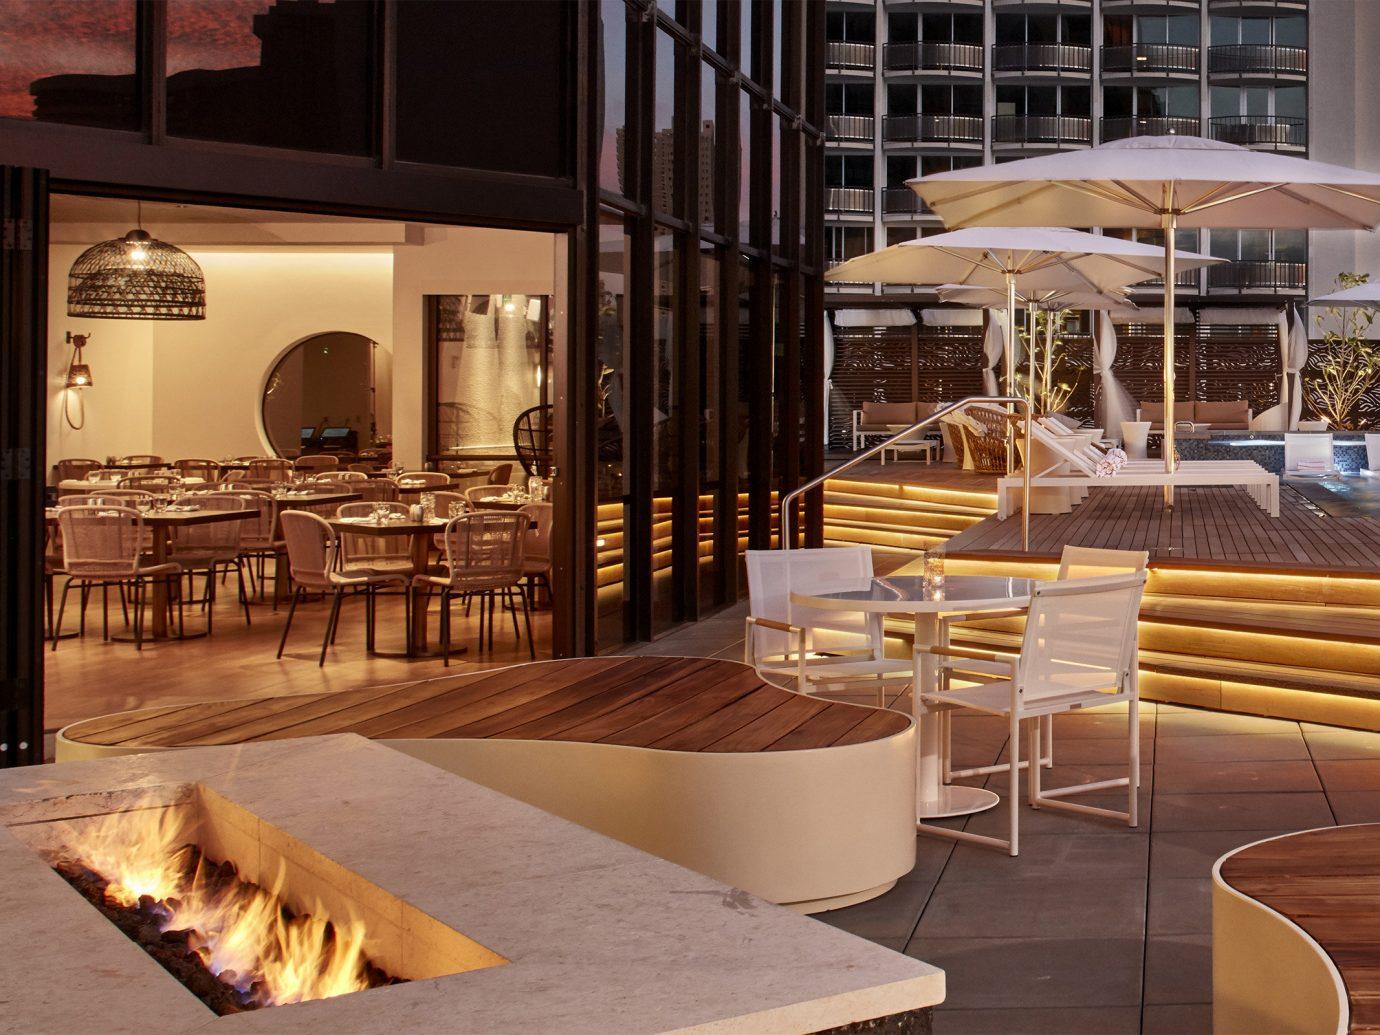 Boutique Hotels interior design wood furniture Lobby restaurant table estate